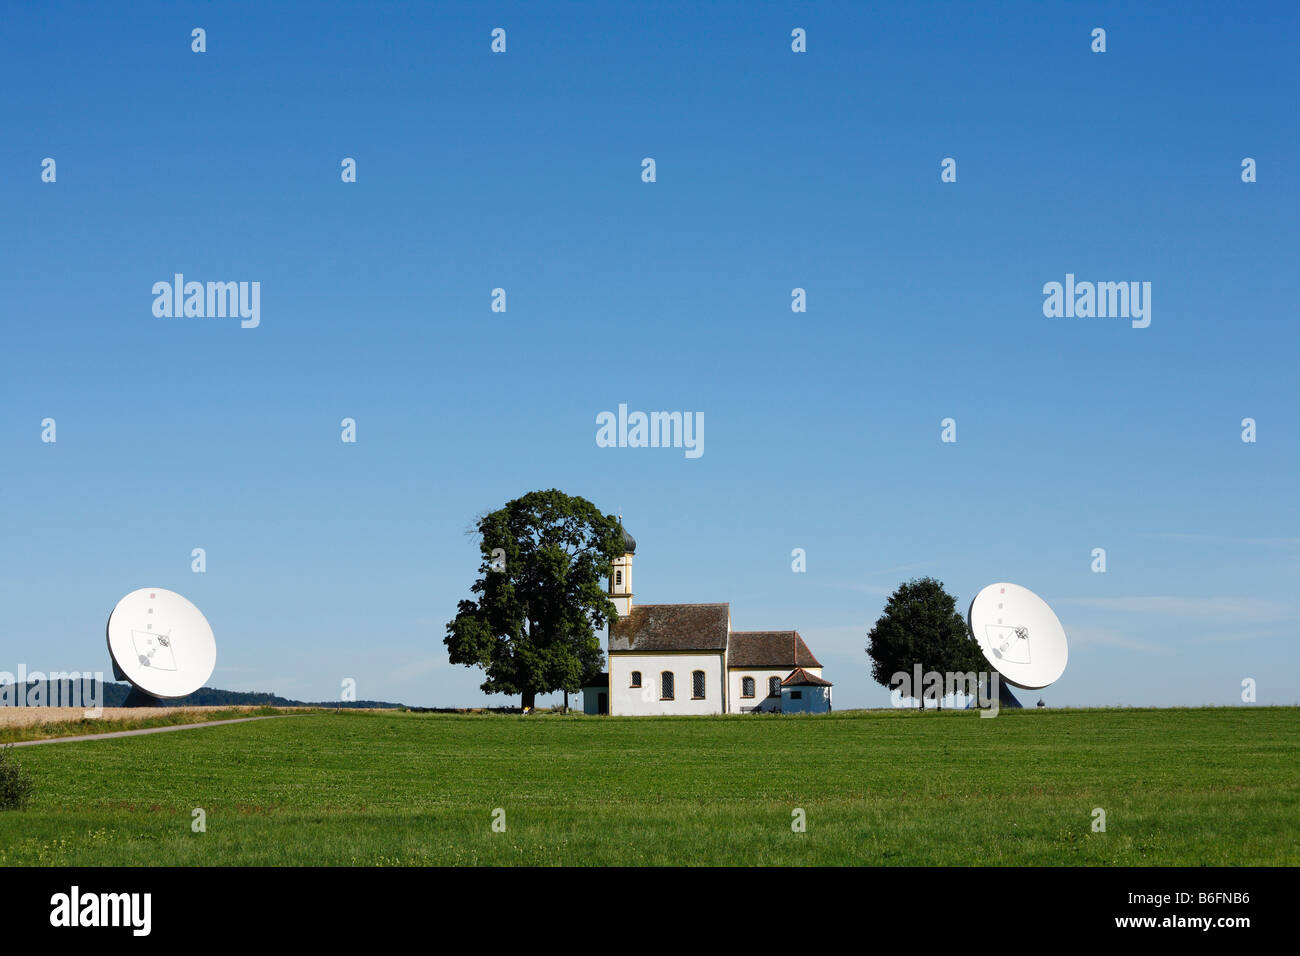 Radar facility, Raisting radar dome with St. Johann's Chapel, Pfaffenwinkel, Upper Bavaria, Germany, Europe - Stock Image